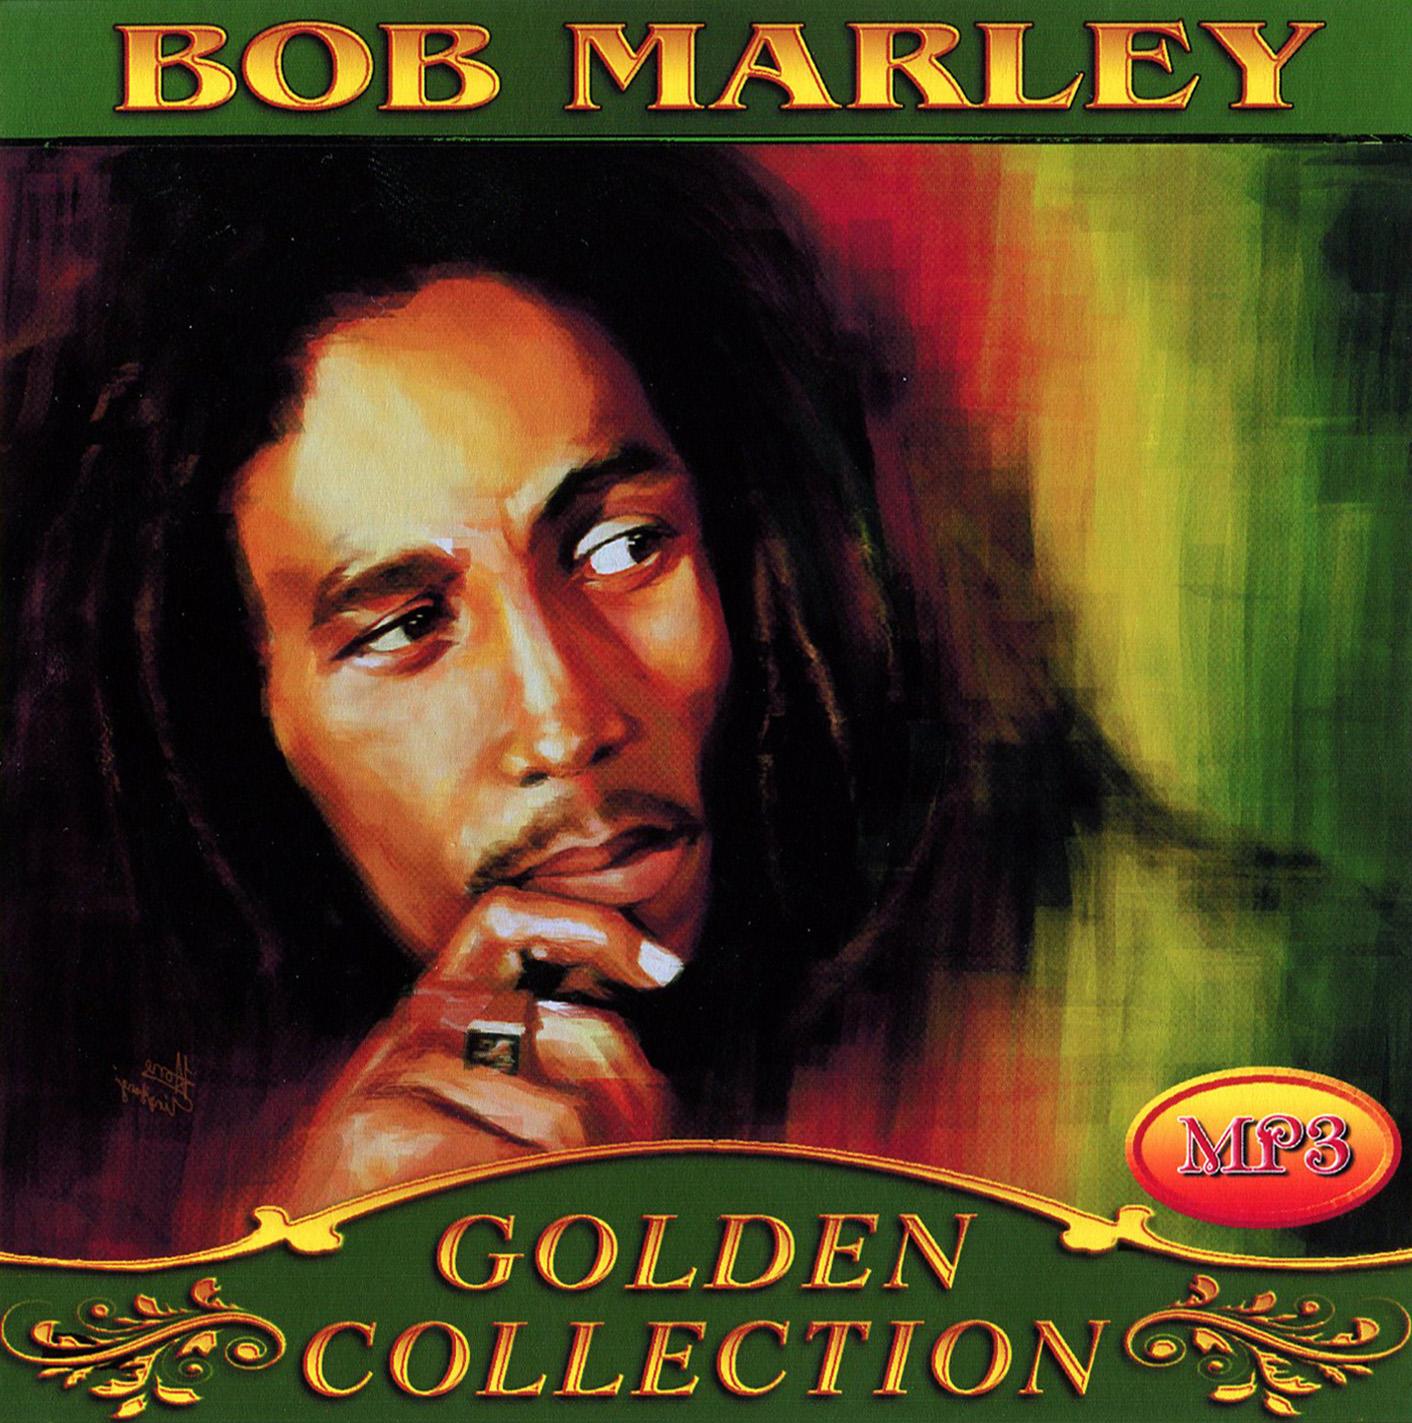 Bob Marley [mp3]